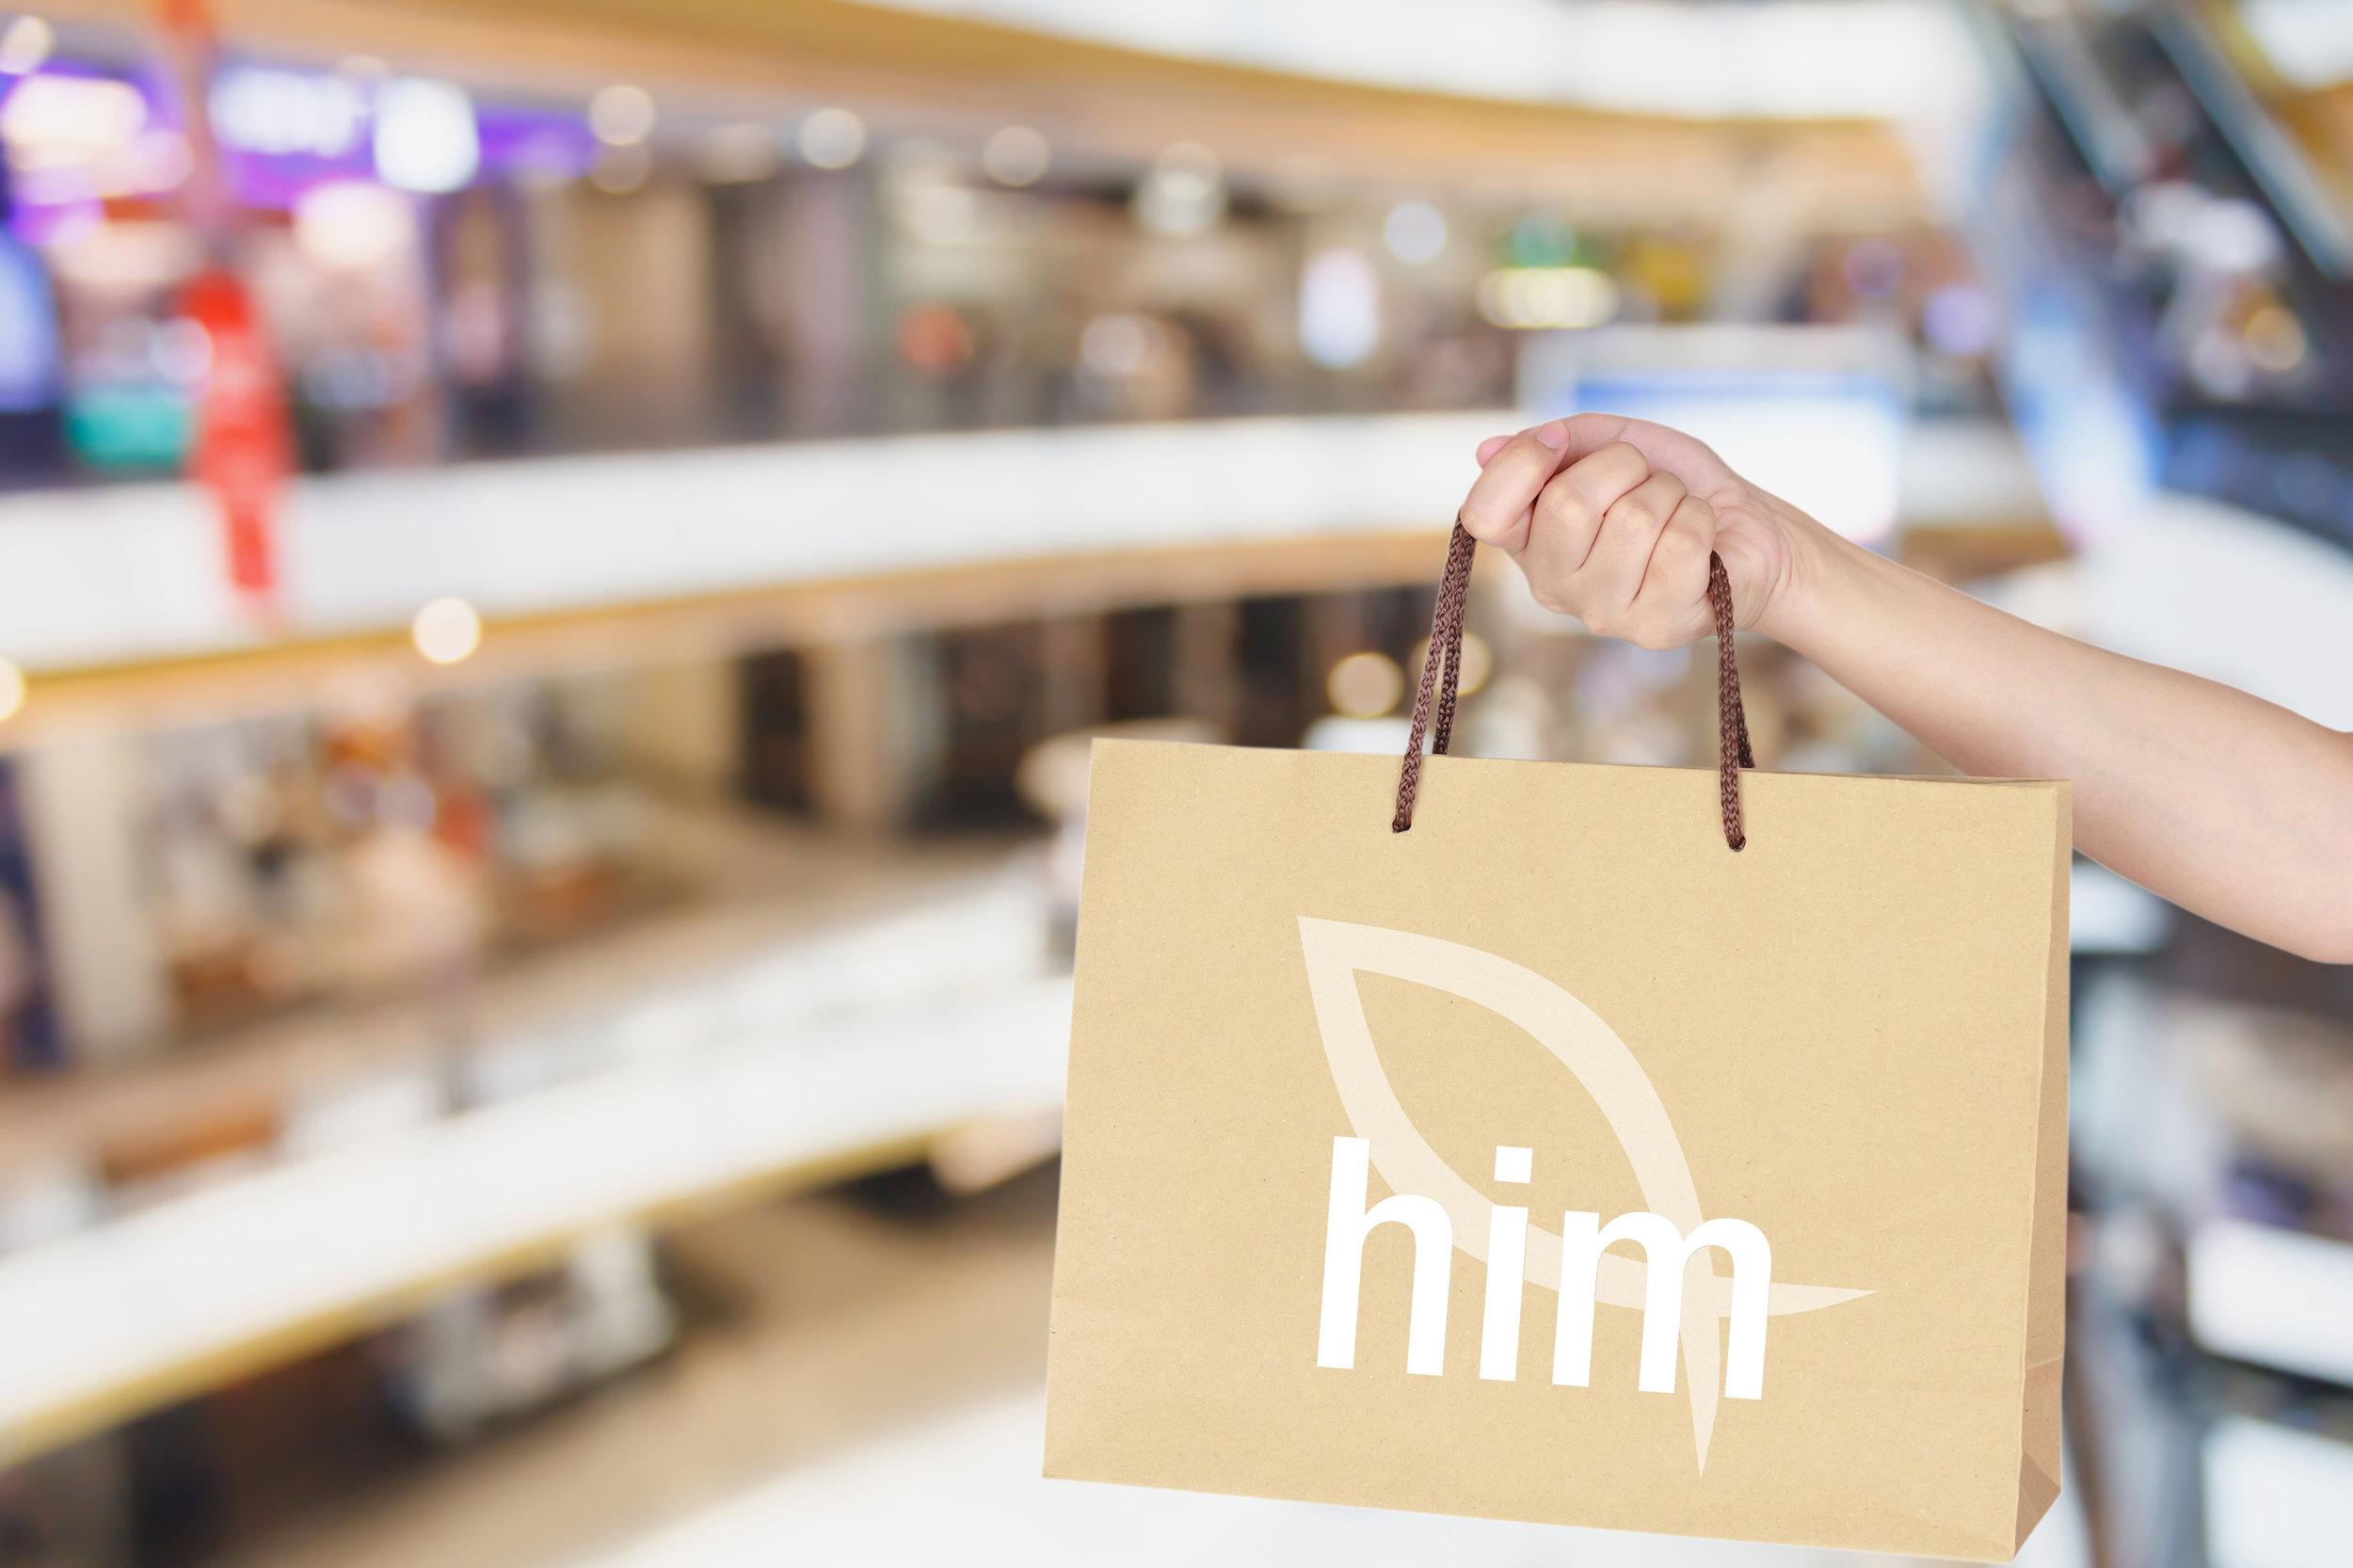 HIM shopping bag new logo.jpg